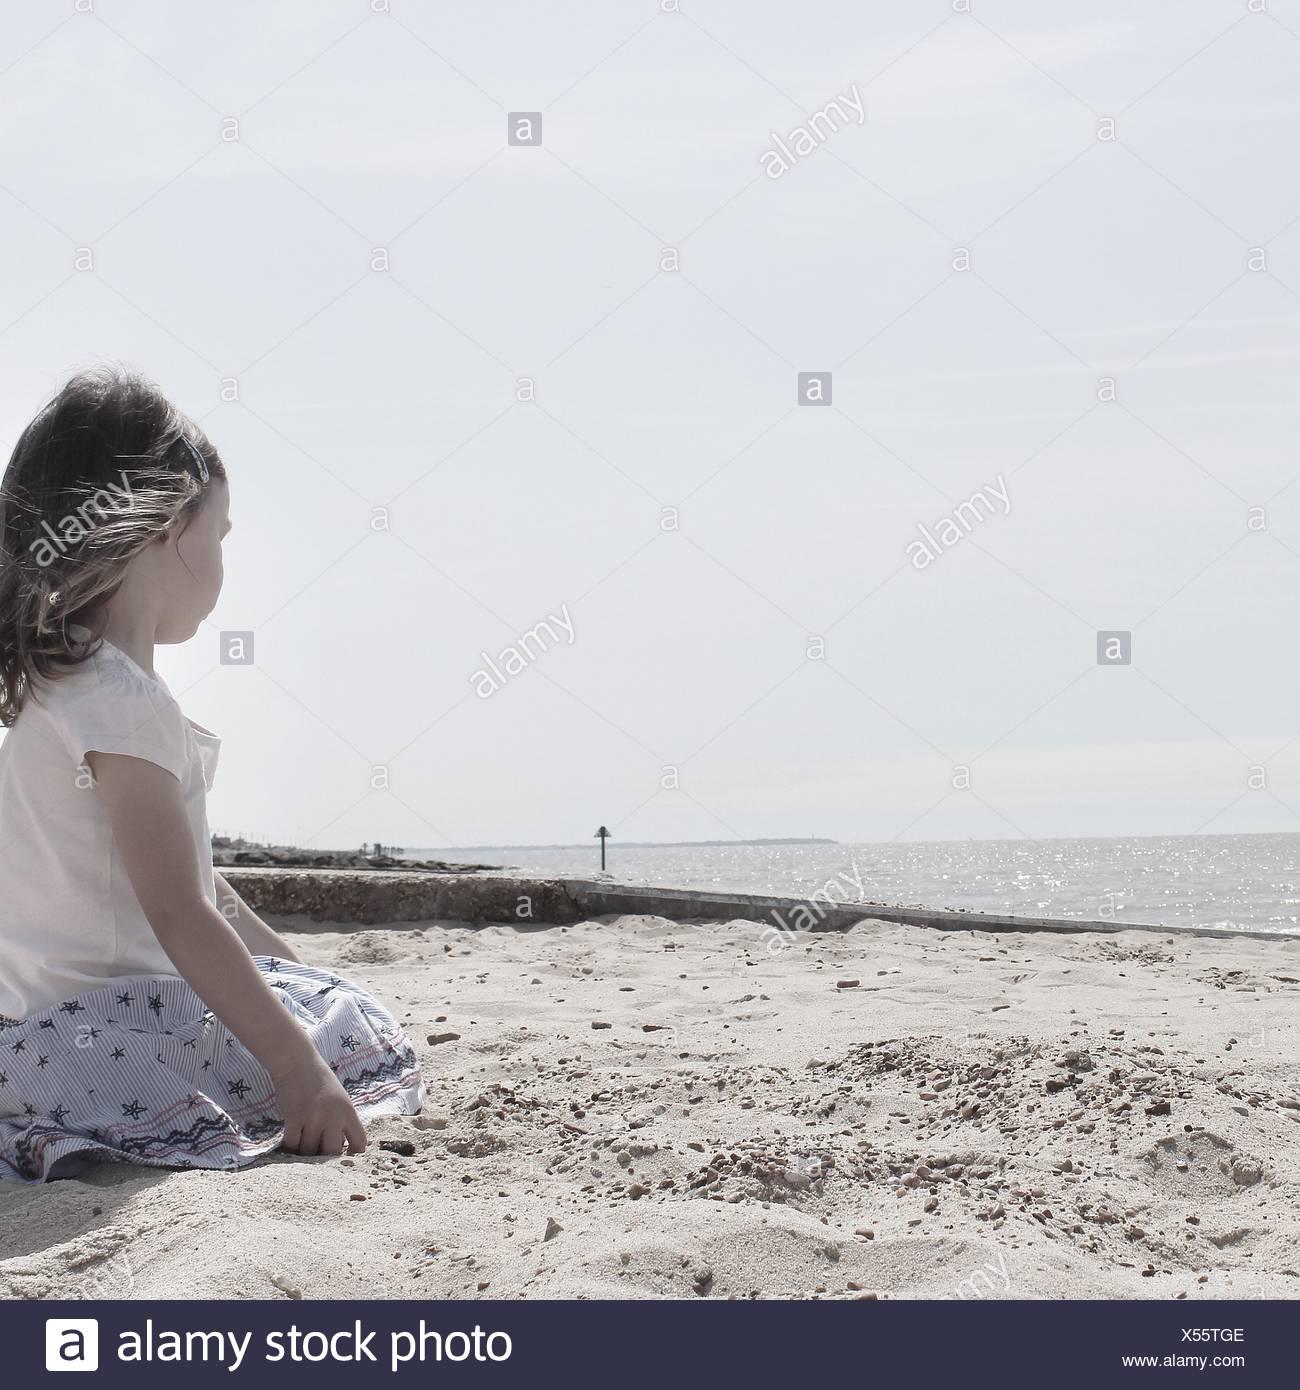 Girl sitting on the beach - Stock Image